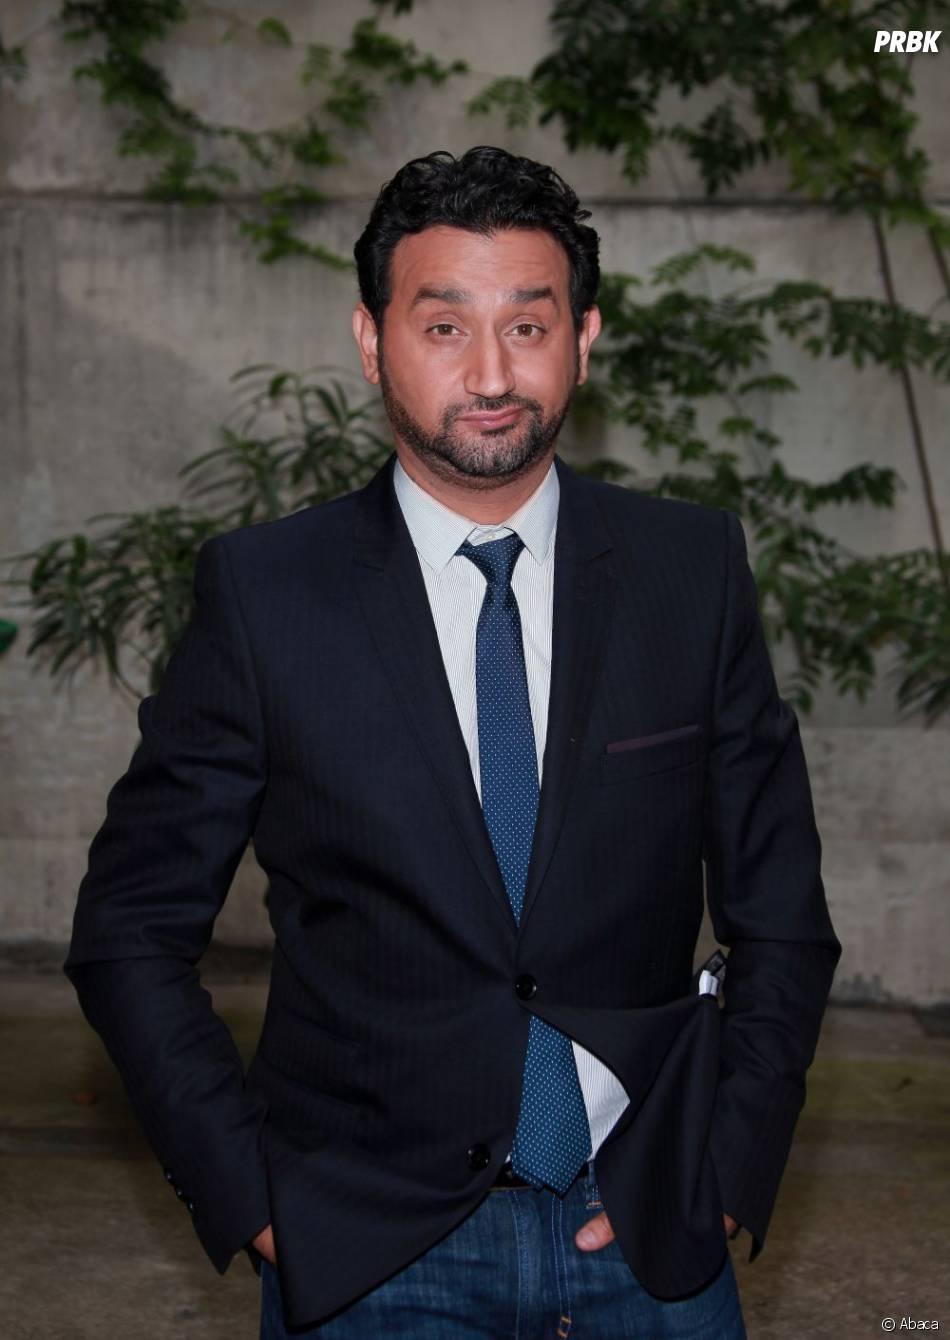 Cyril Hanouna : les clashs avec Jean-Marc Morandini ? De la vanne